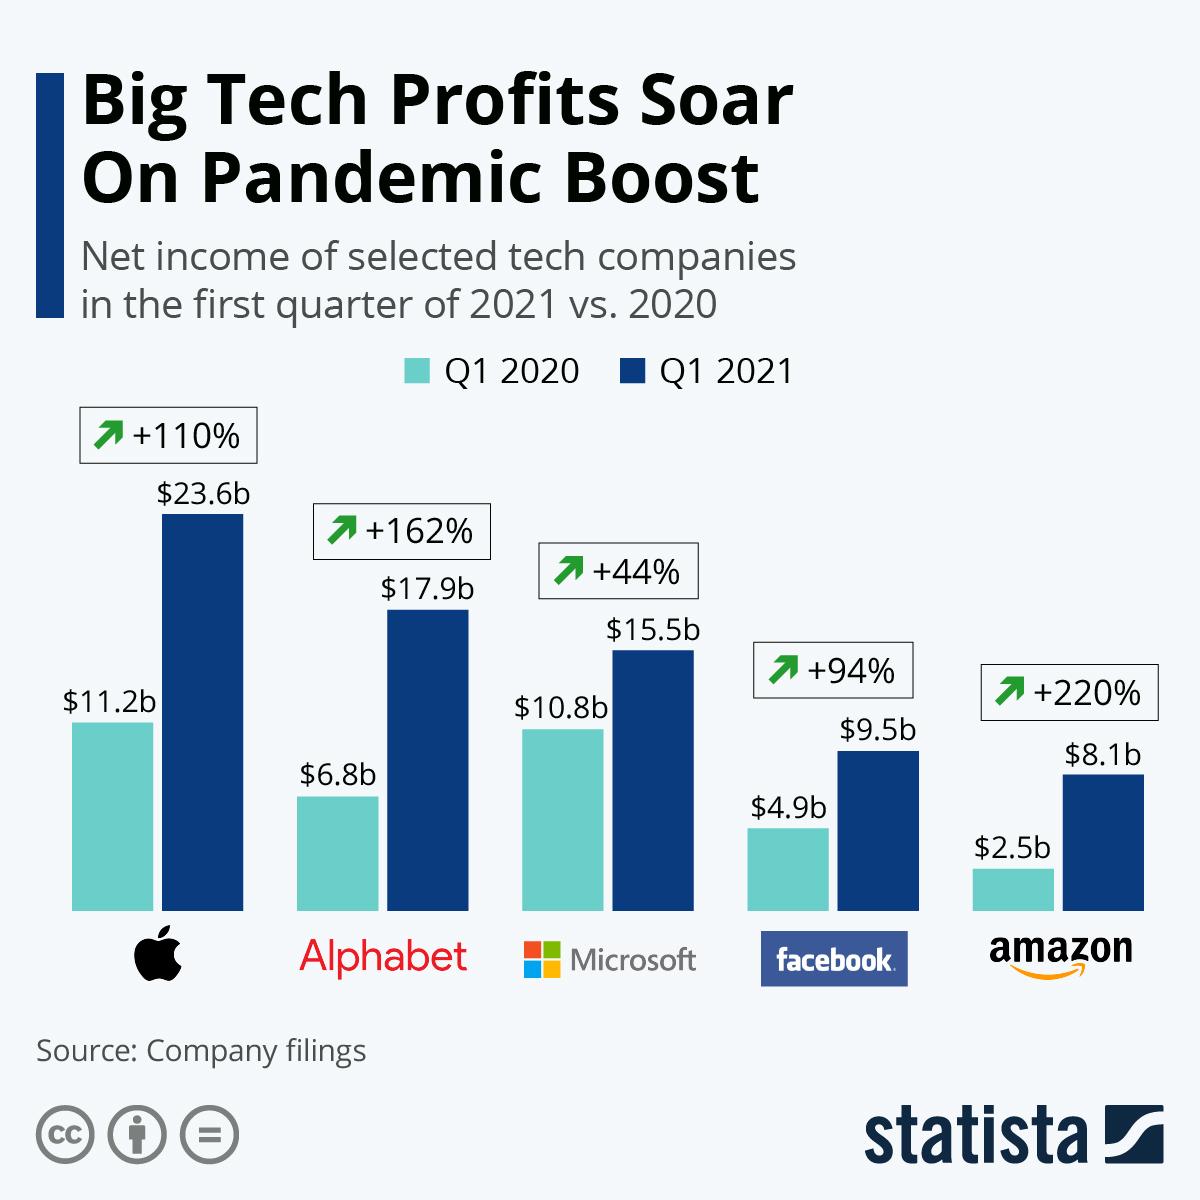 Big Tech Profits Soar On Pandemic Boost